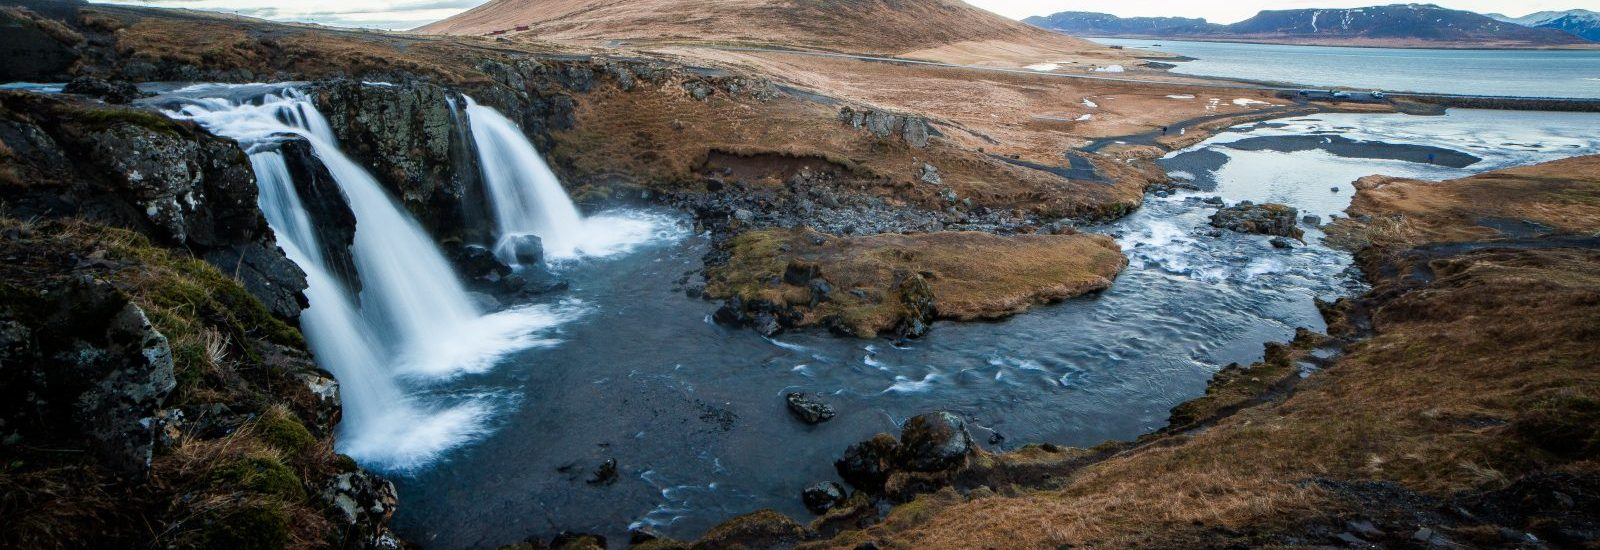 Planning Iceland